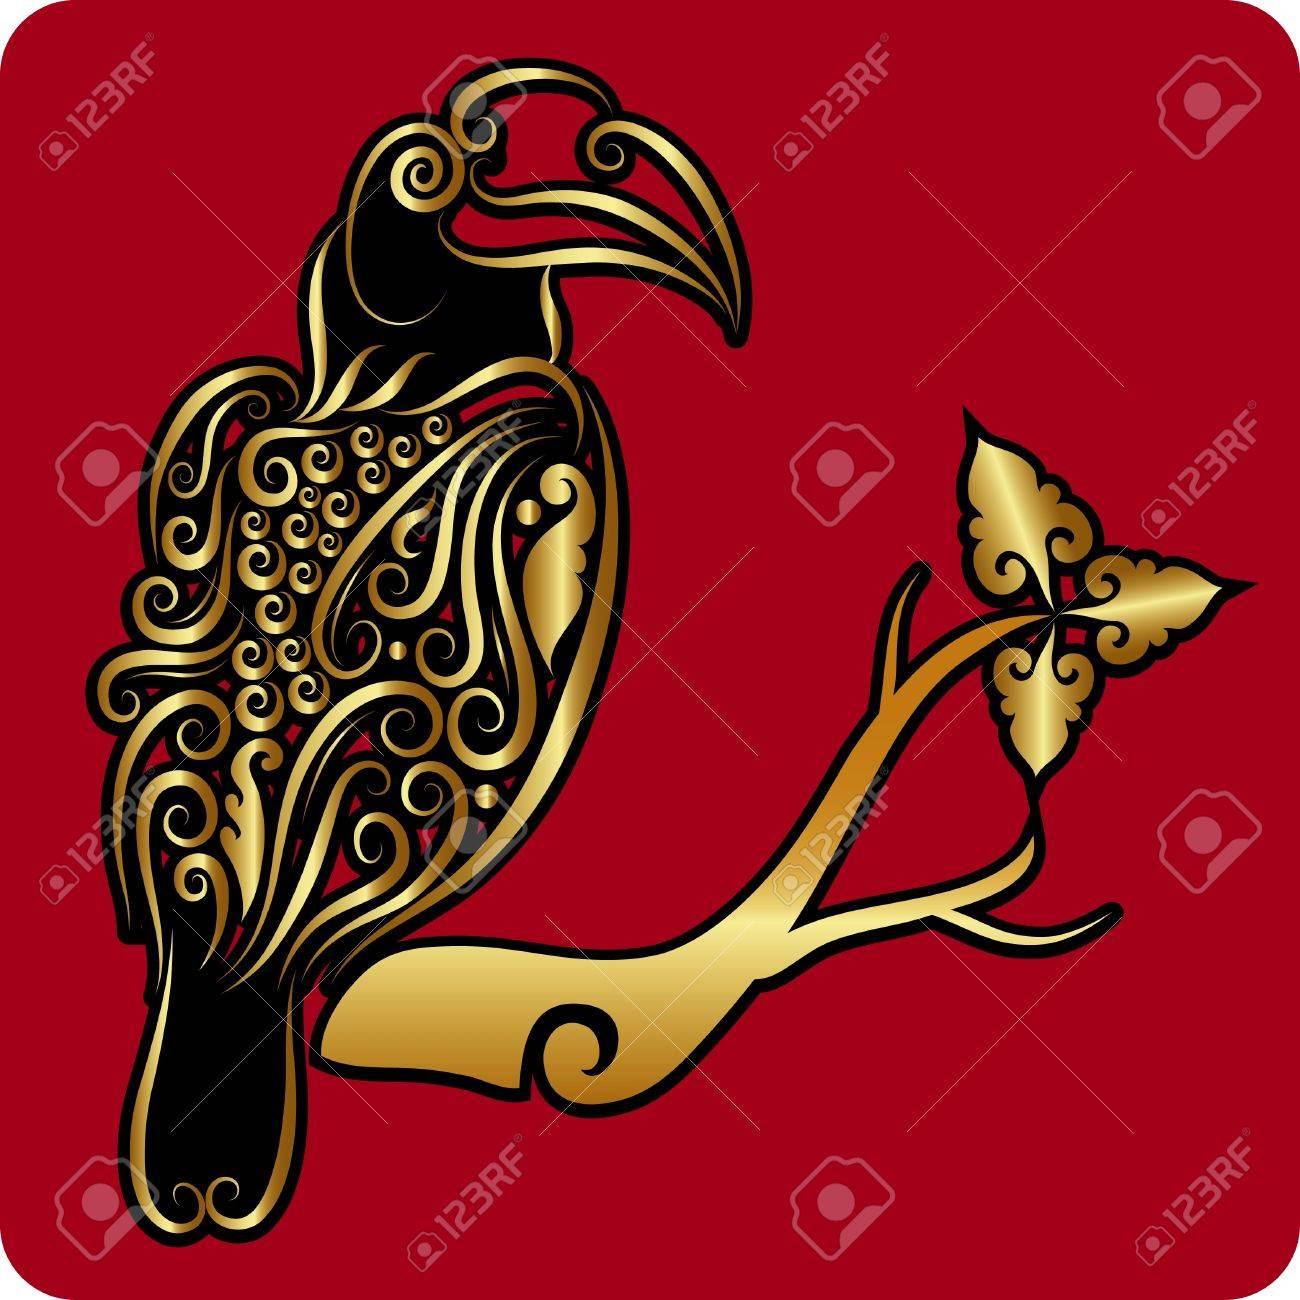 Golden bird 2 ornament vector Stock Vector - 15330641